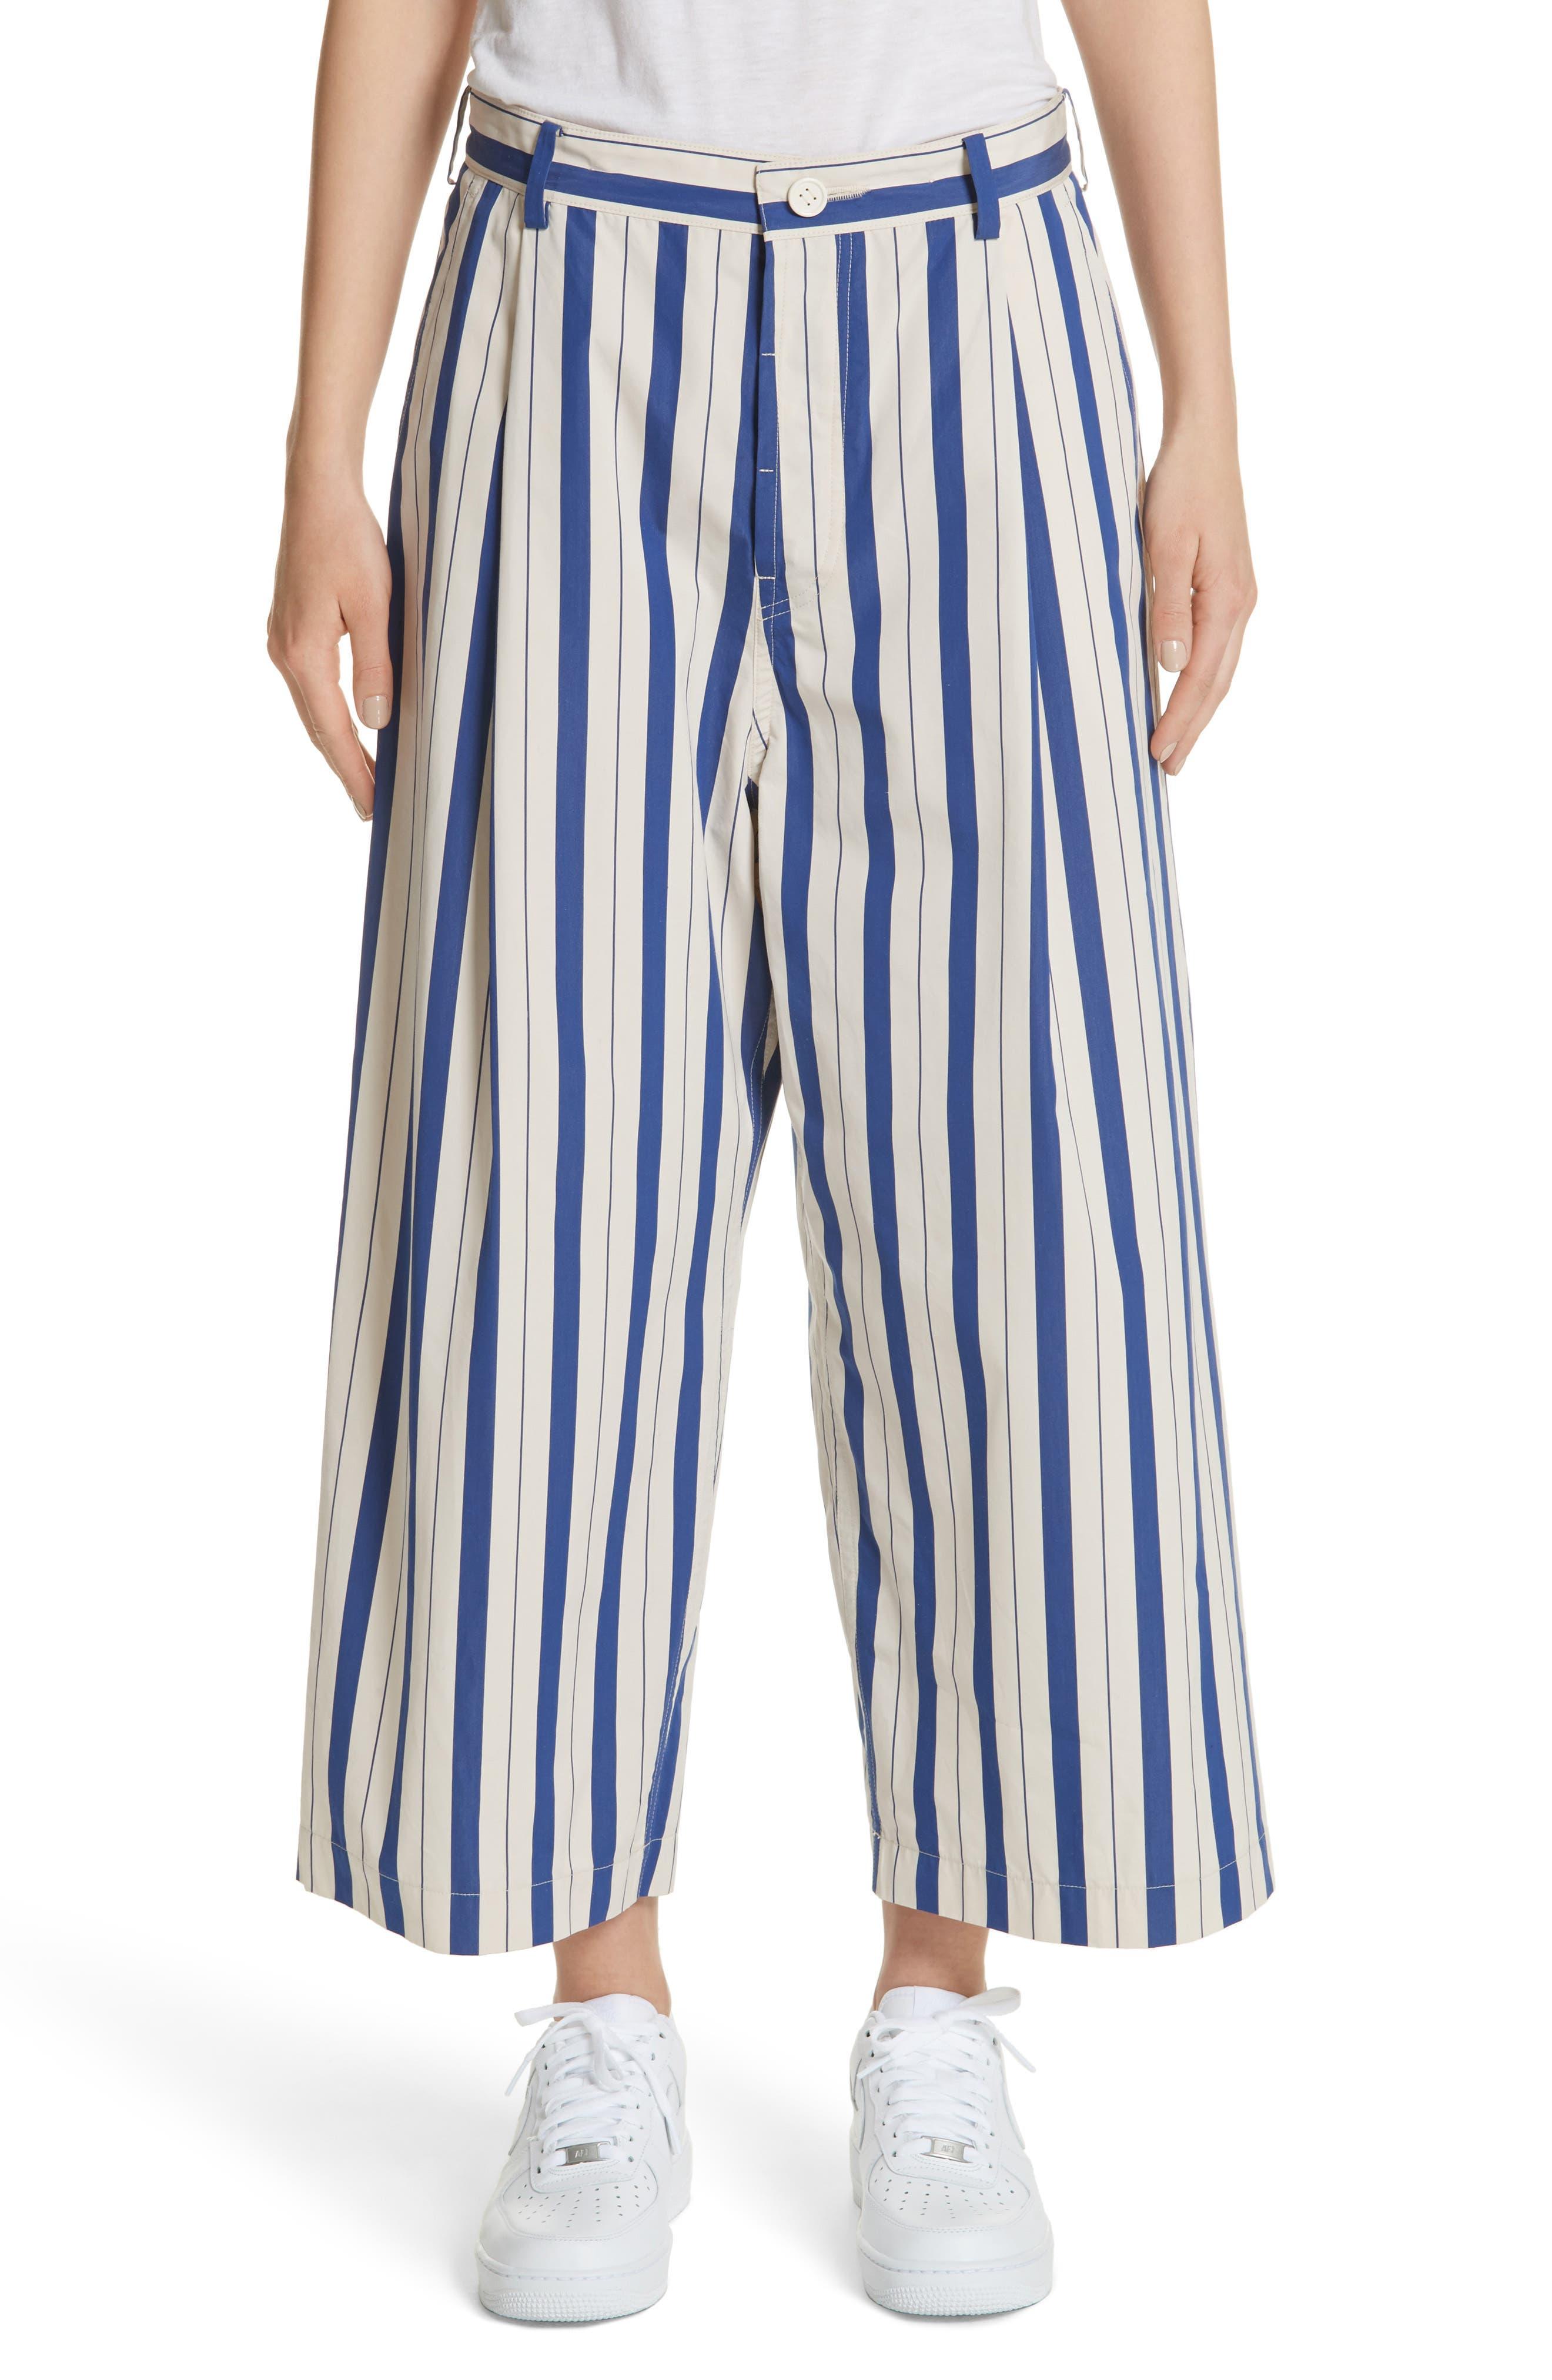 Sofie D'Hoore Stripe Wide Leg Pants